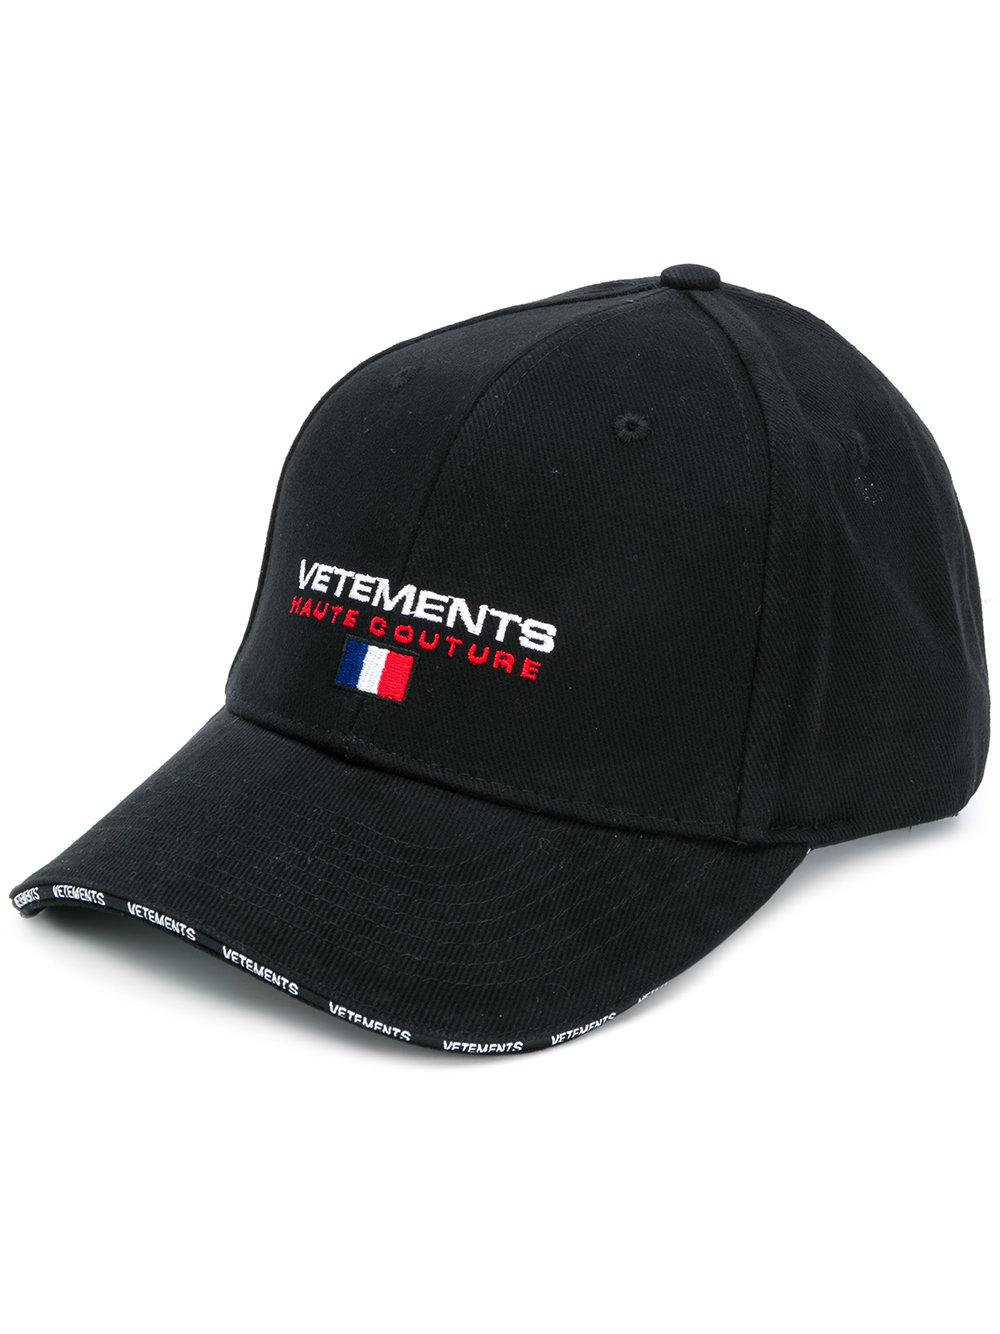 Vetements Logo Cotton Cap in Black for Men - Lyst afac0779fd85